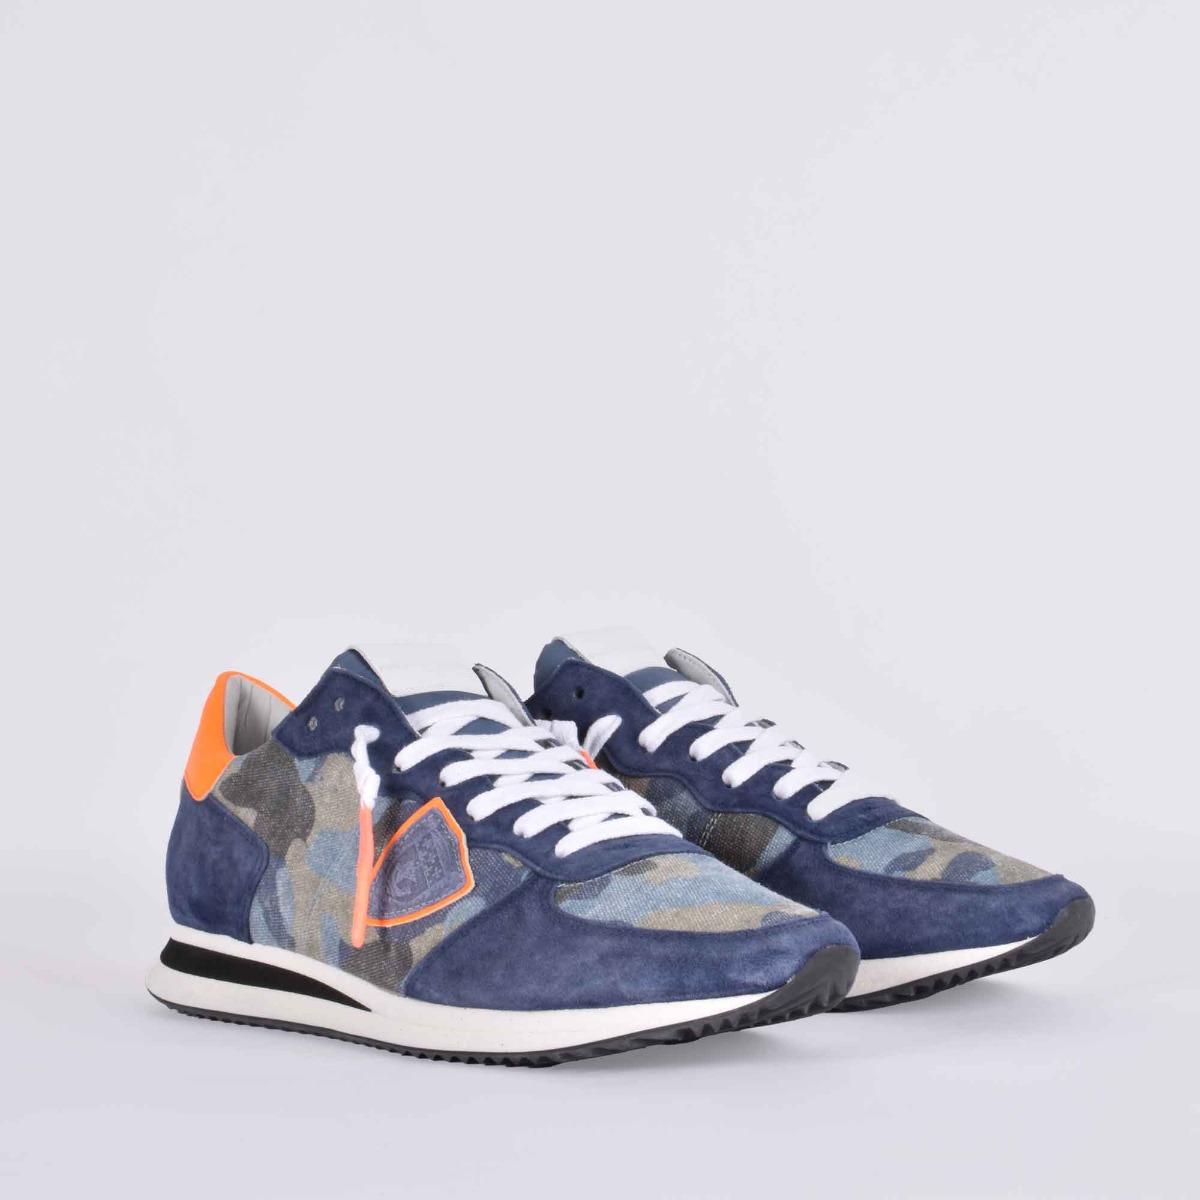 Trpx camouflage neon- Blu jeans/ orange